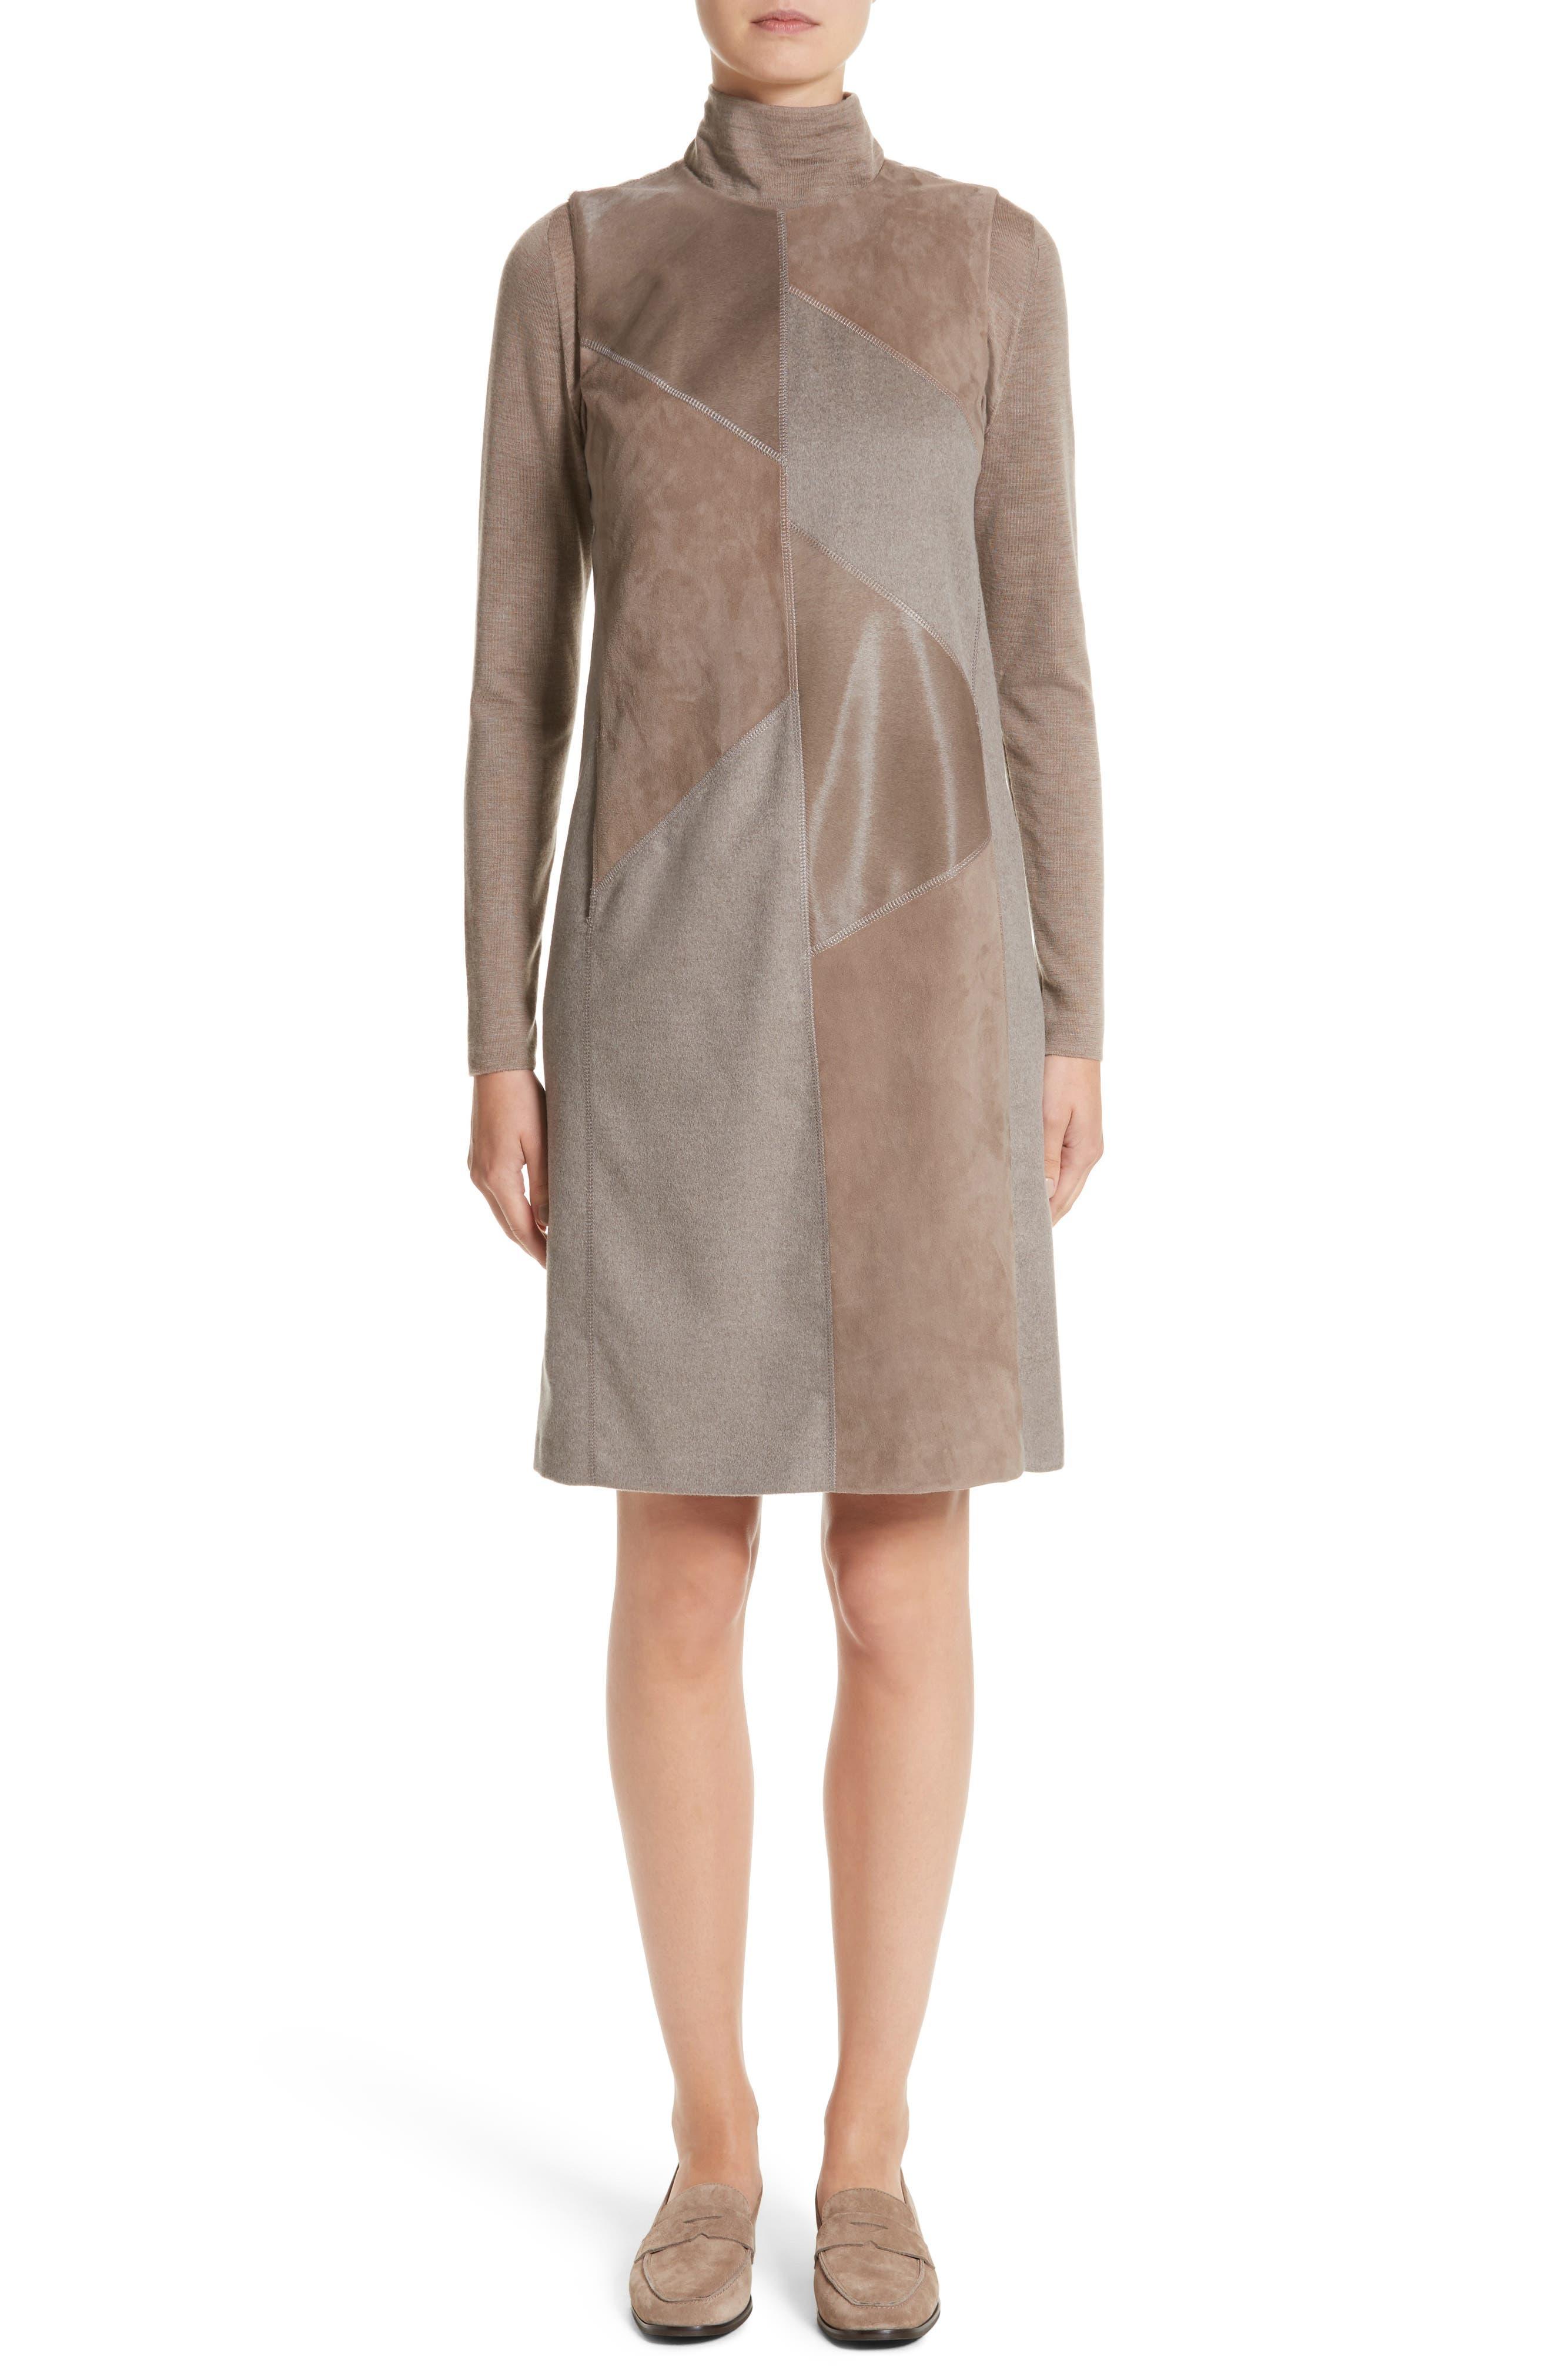 Lafayette 148 New York Daren Loro Piana® Mélange Cashmere Dress with Suede & Genuine Calf Hair Trim